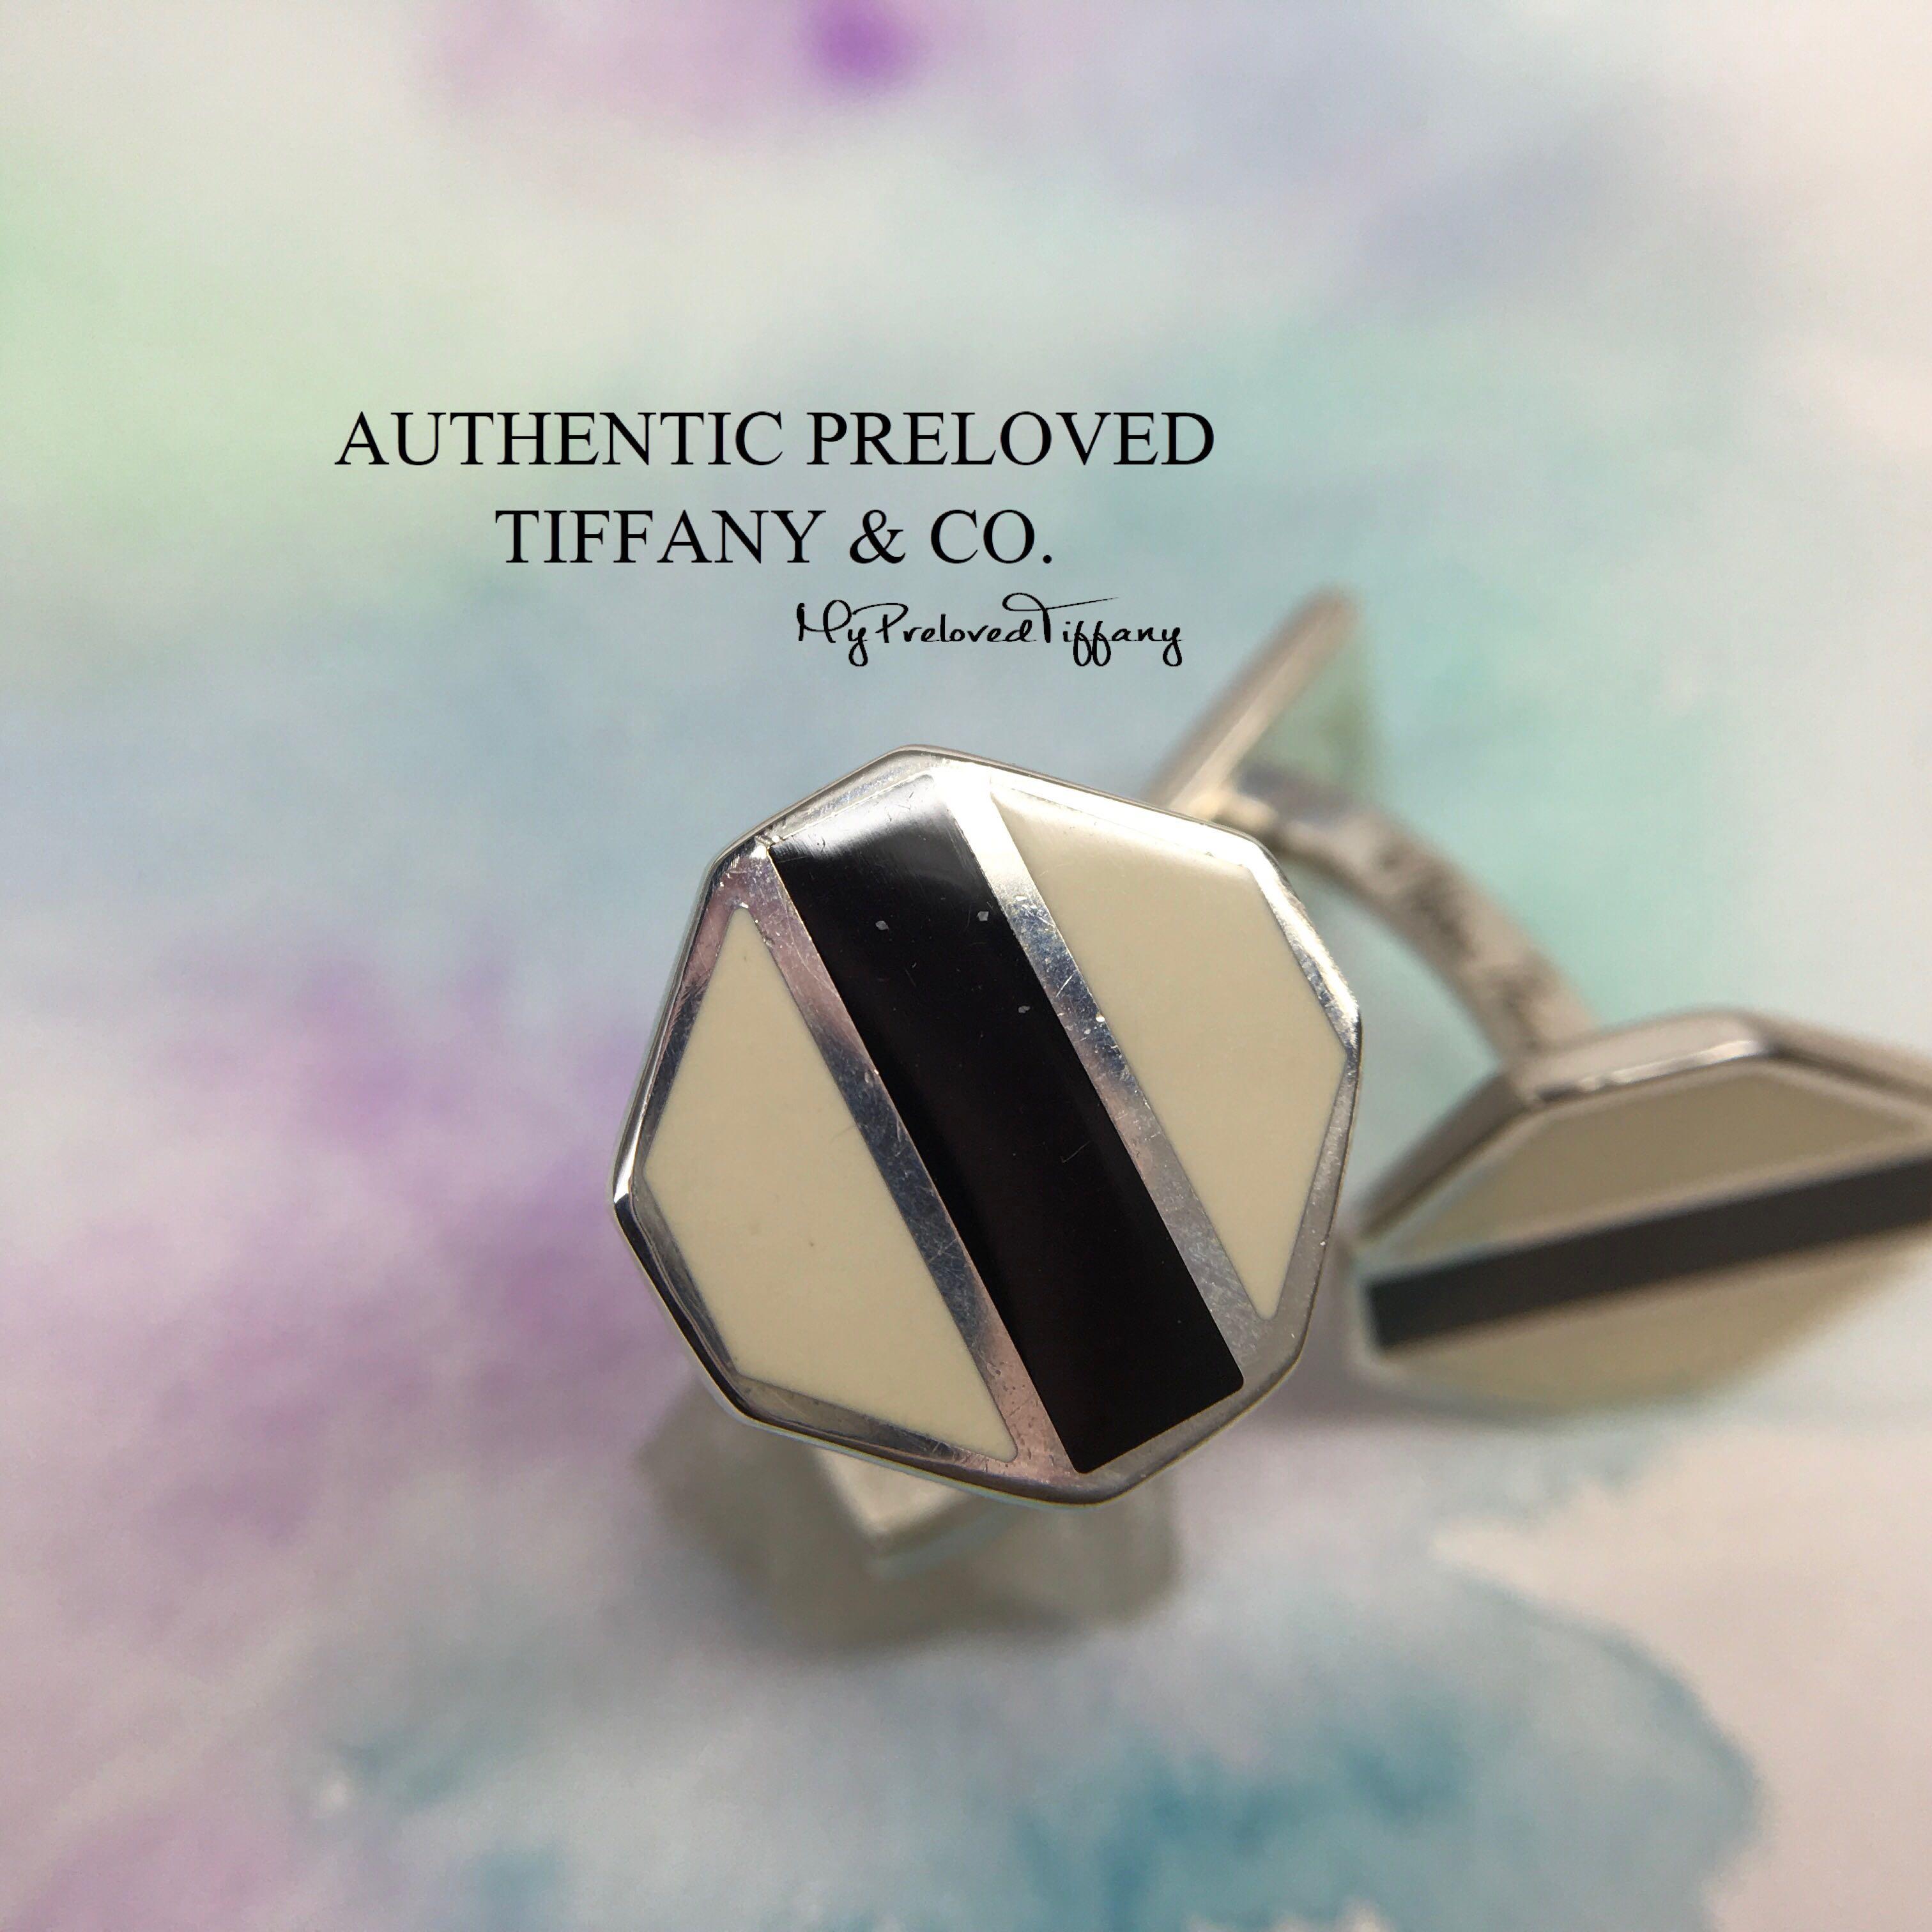 07a76ef13 Authentic Rare Tiffany & Co. Paloma Picasso Zellige Black White ...